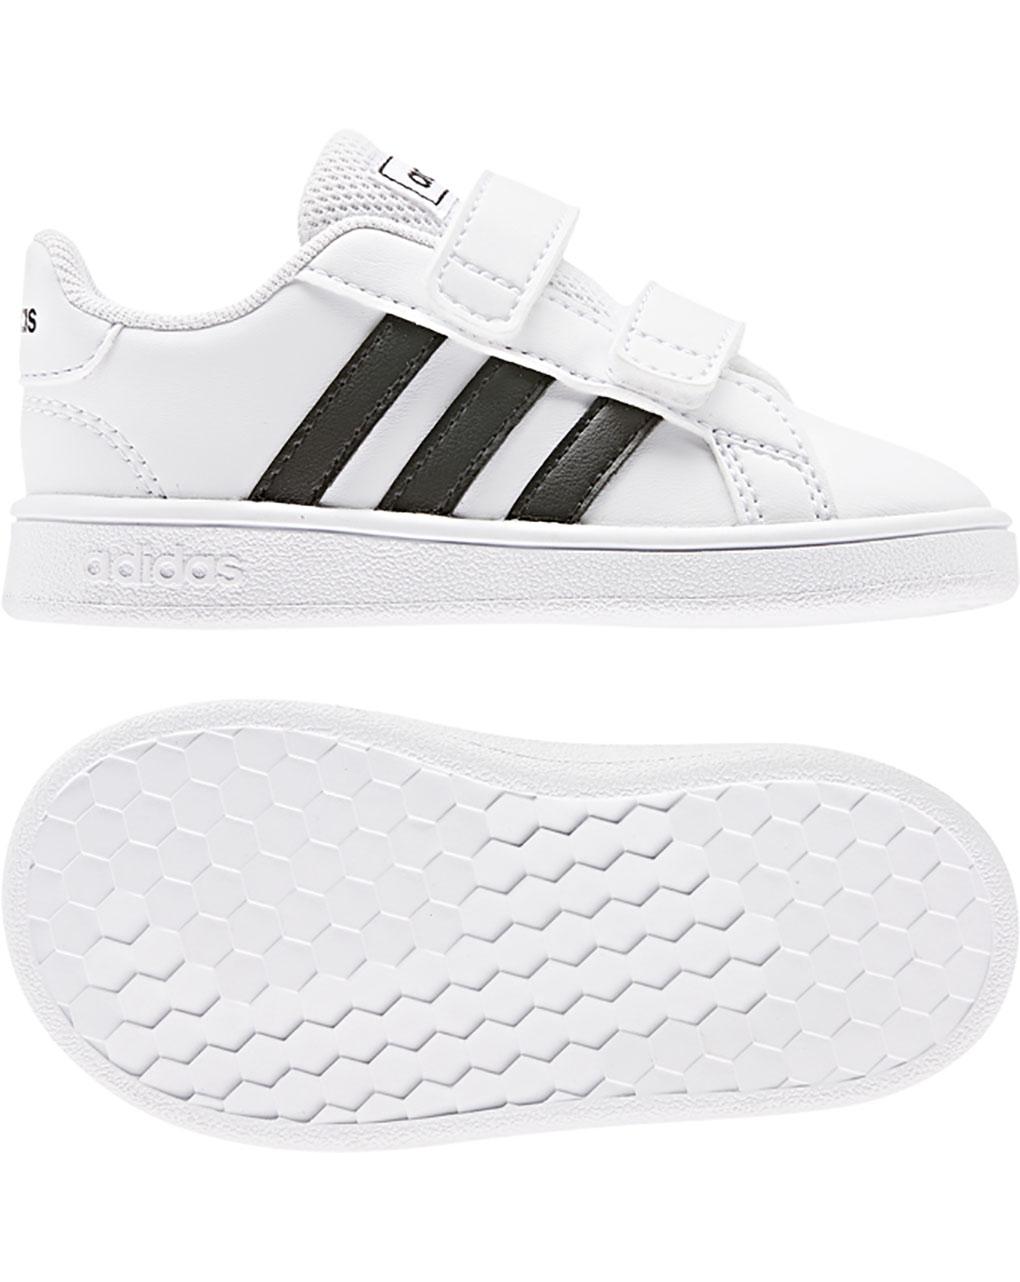 Adidas sneaker baby unisex lifestyle chiusura a strappo - Adidas